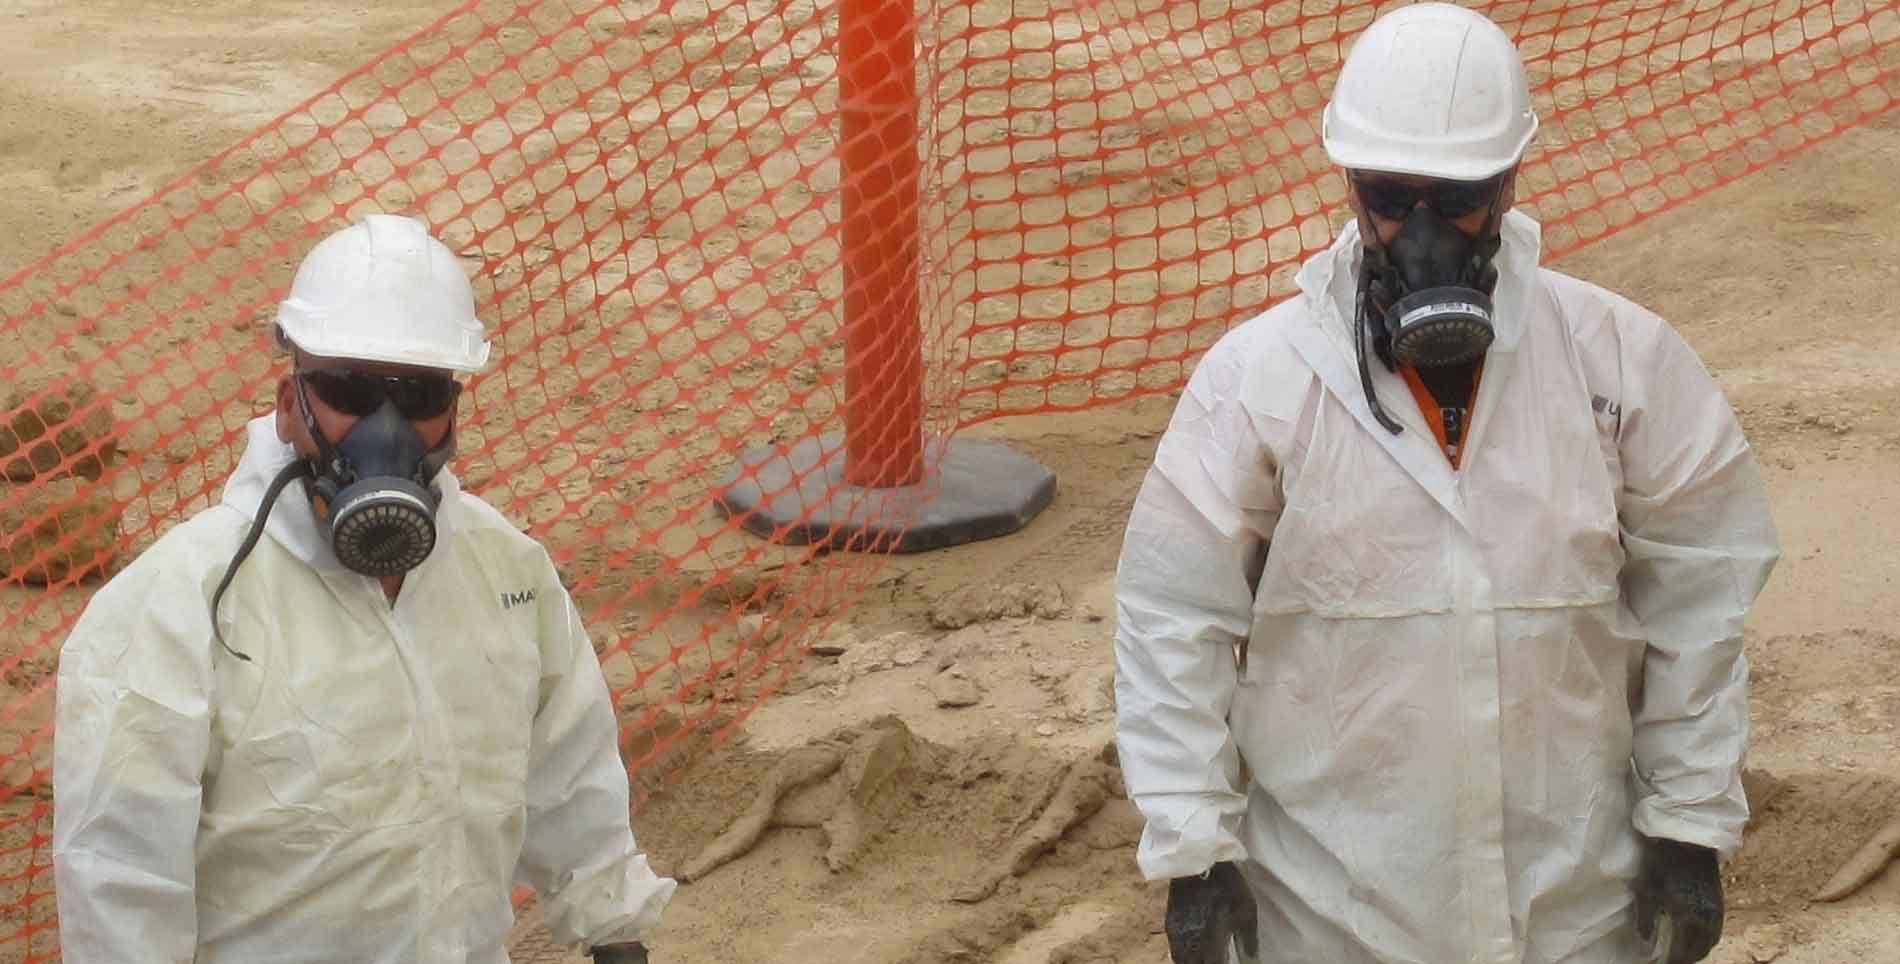 Asbestos Removal Adelaide Asbestos Fence Removal Asbestos Bathroom Roof Removal Adelaide In 2020 Asbestos Removal How To Remove Removal Company